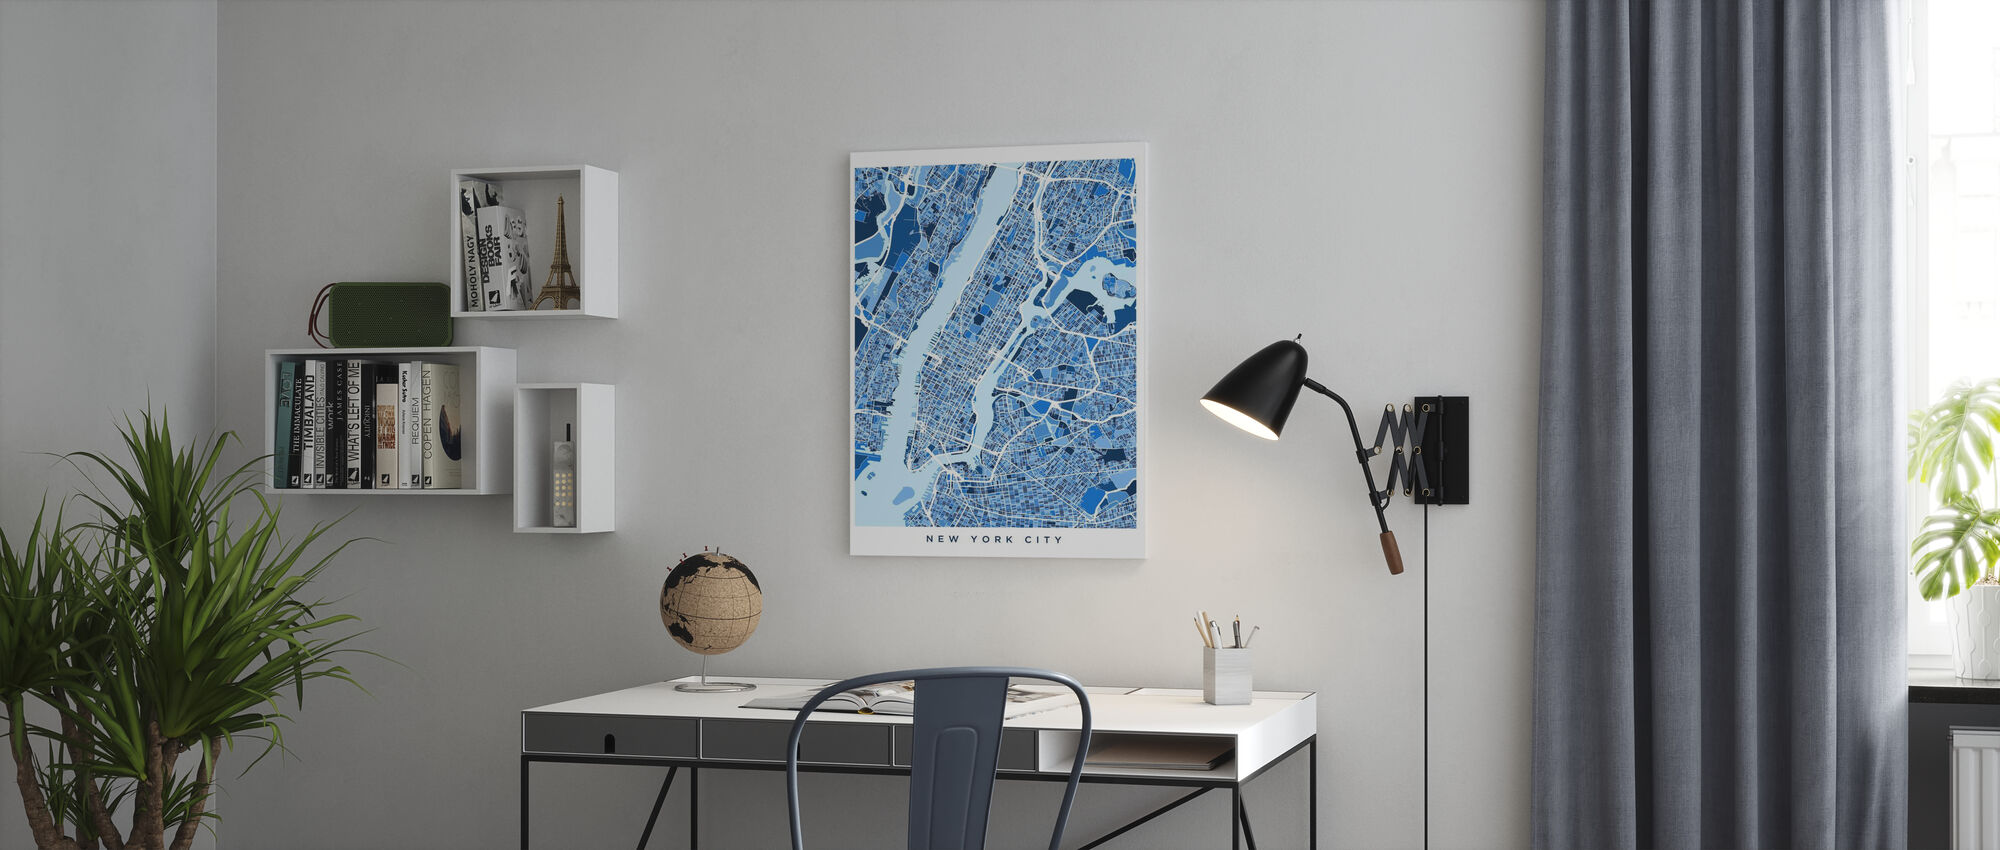 New York City Street Map - Canvas print - Office